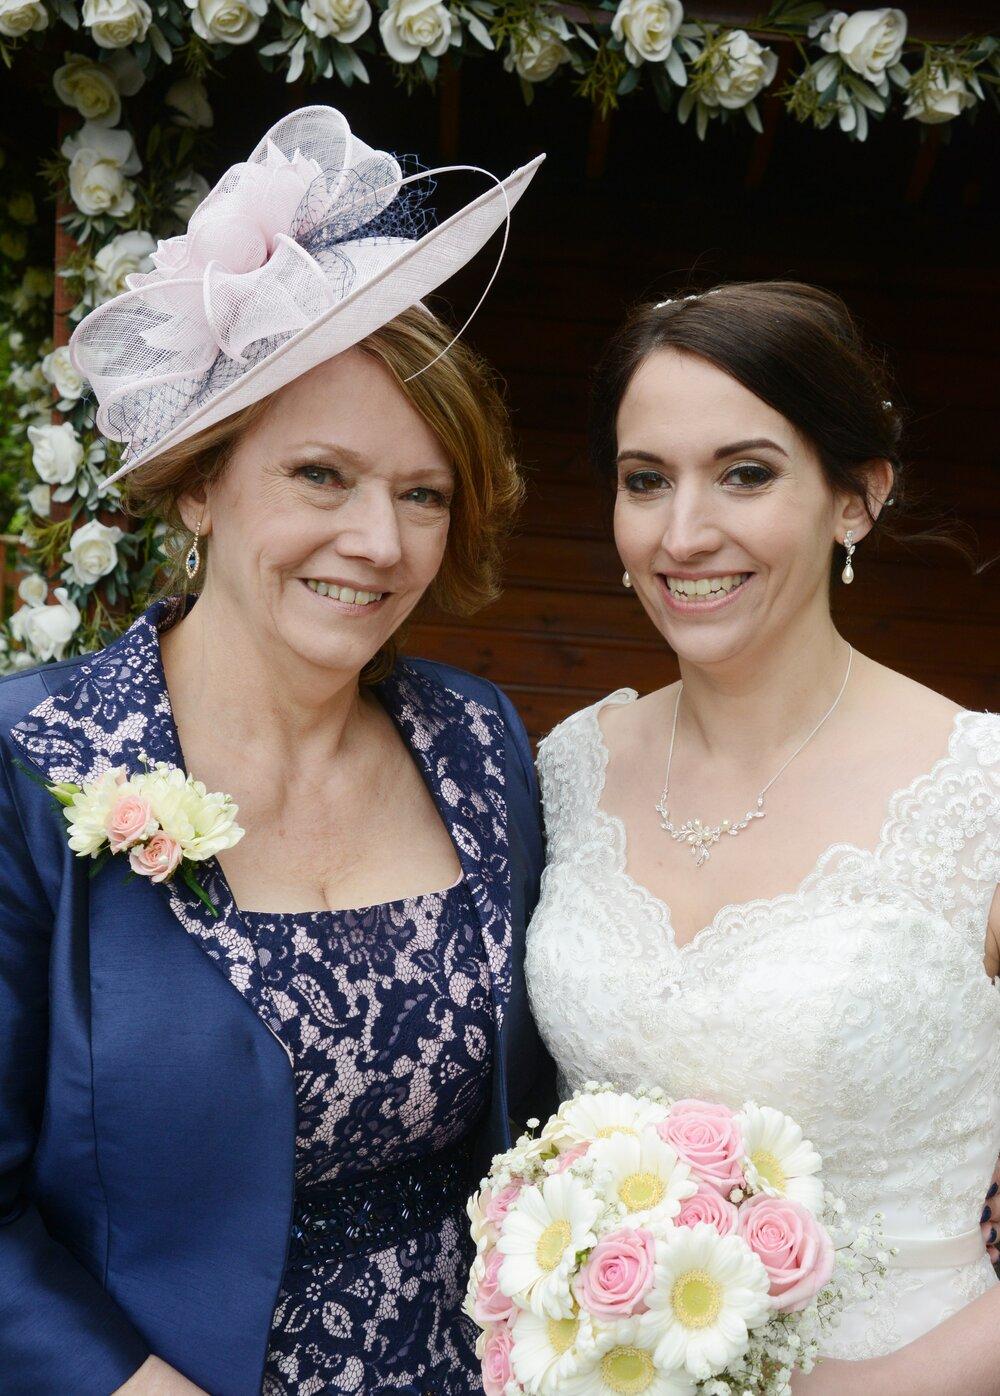 Ruth Hawkins 67 Earns Place In Arkansas Women S Hall Of: Devon Wedding Makeup Artist